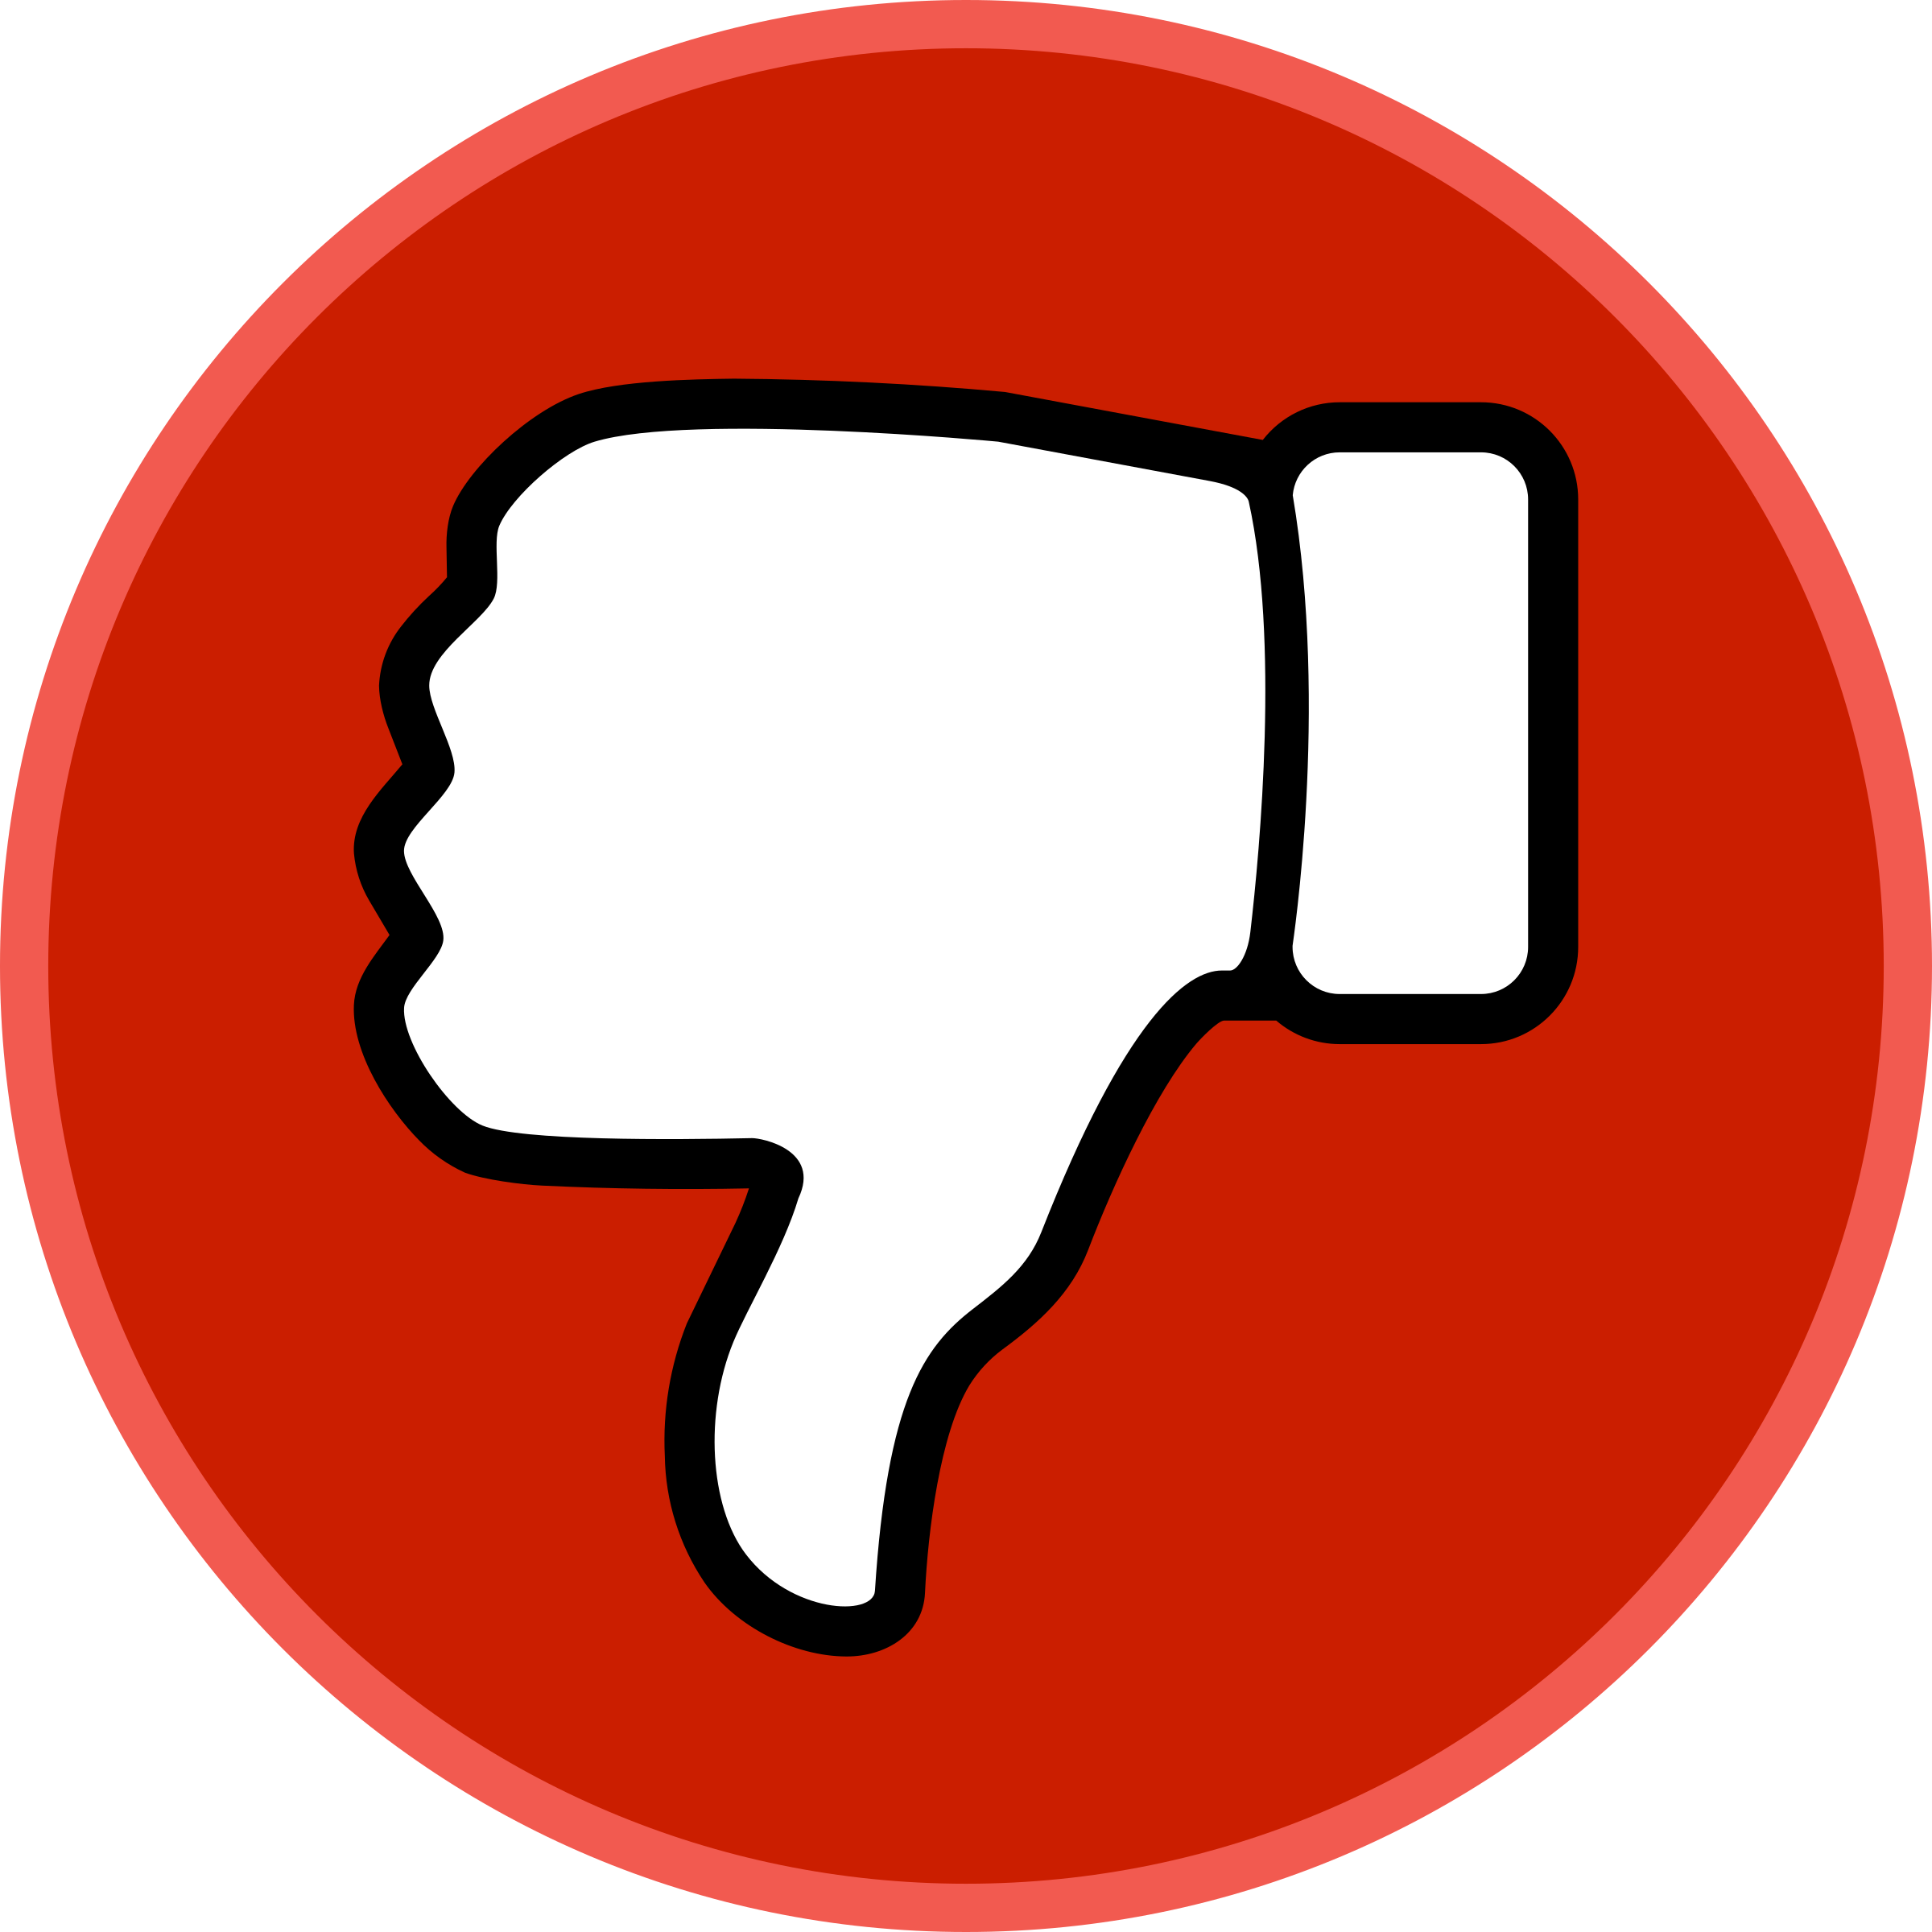 Youtube Dislike Vector Png #45966.